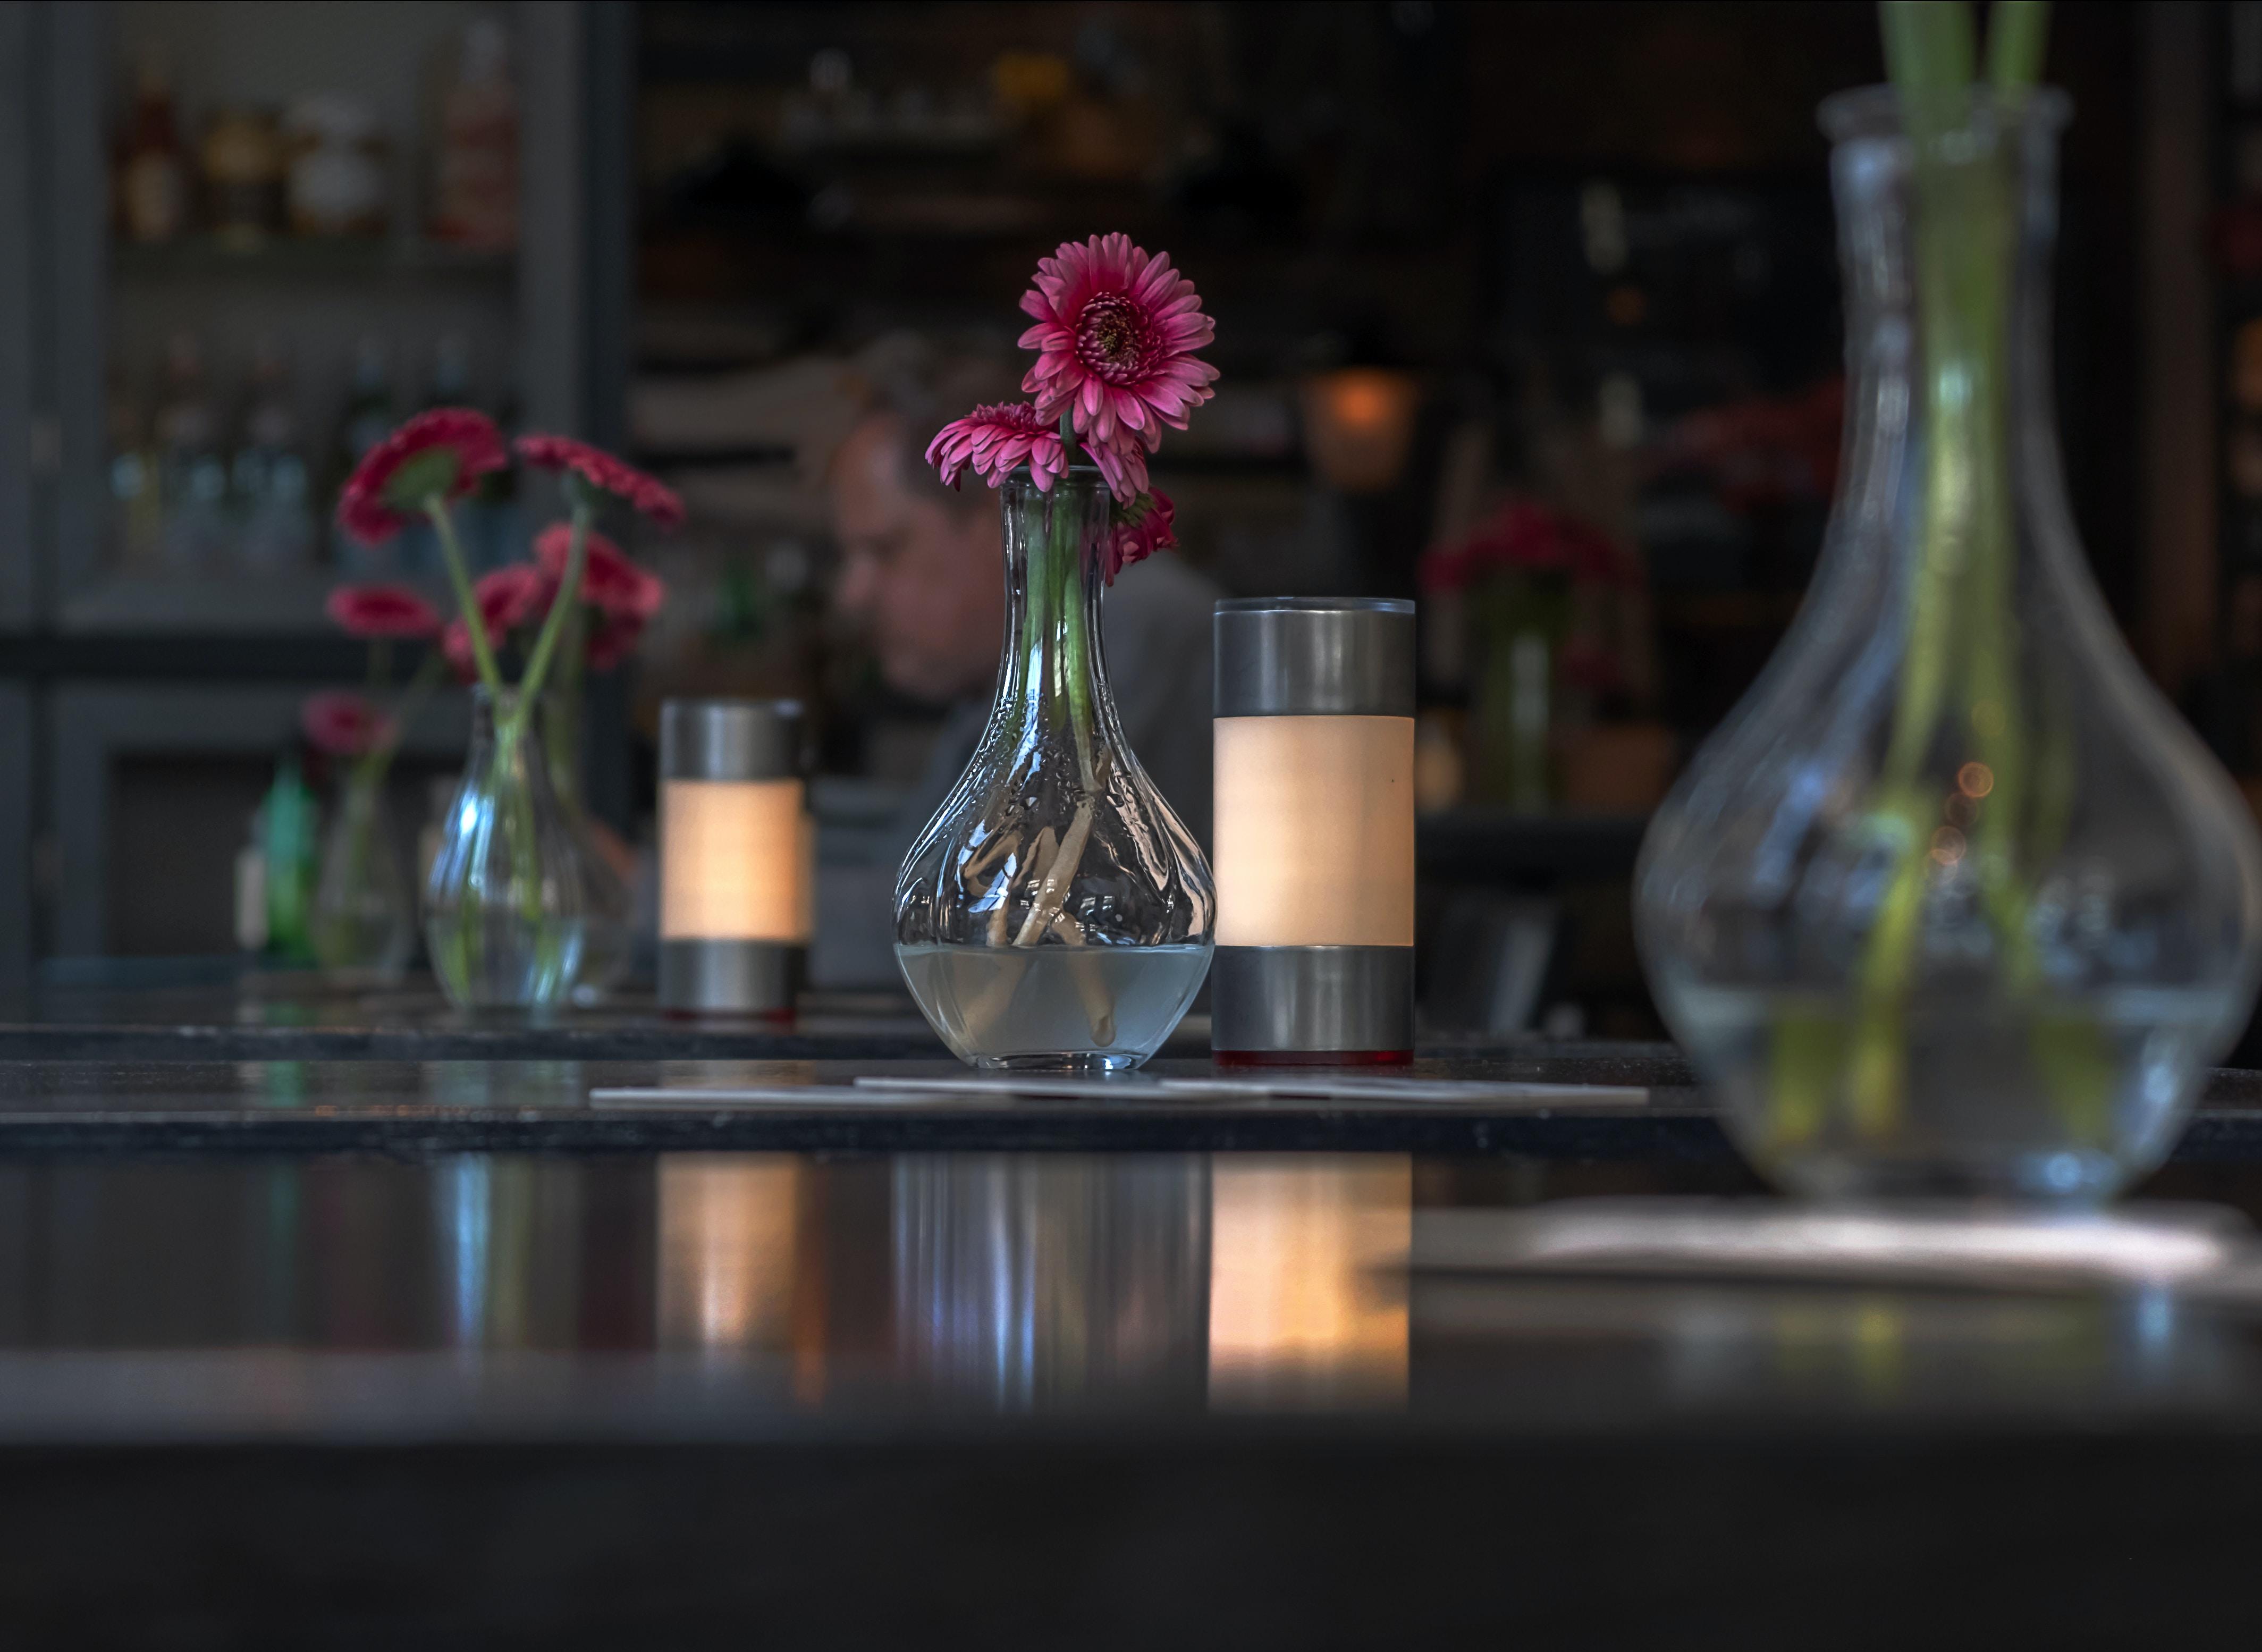 pink petaled flower in vase on tabletop